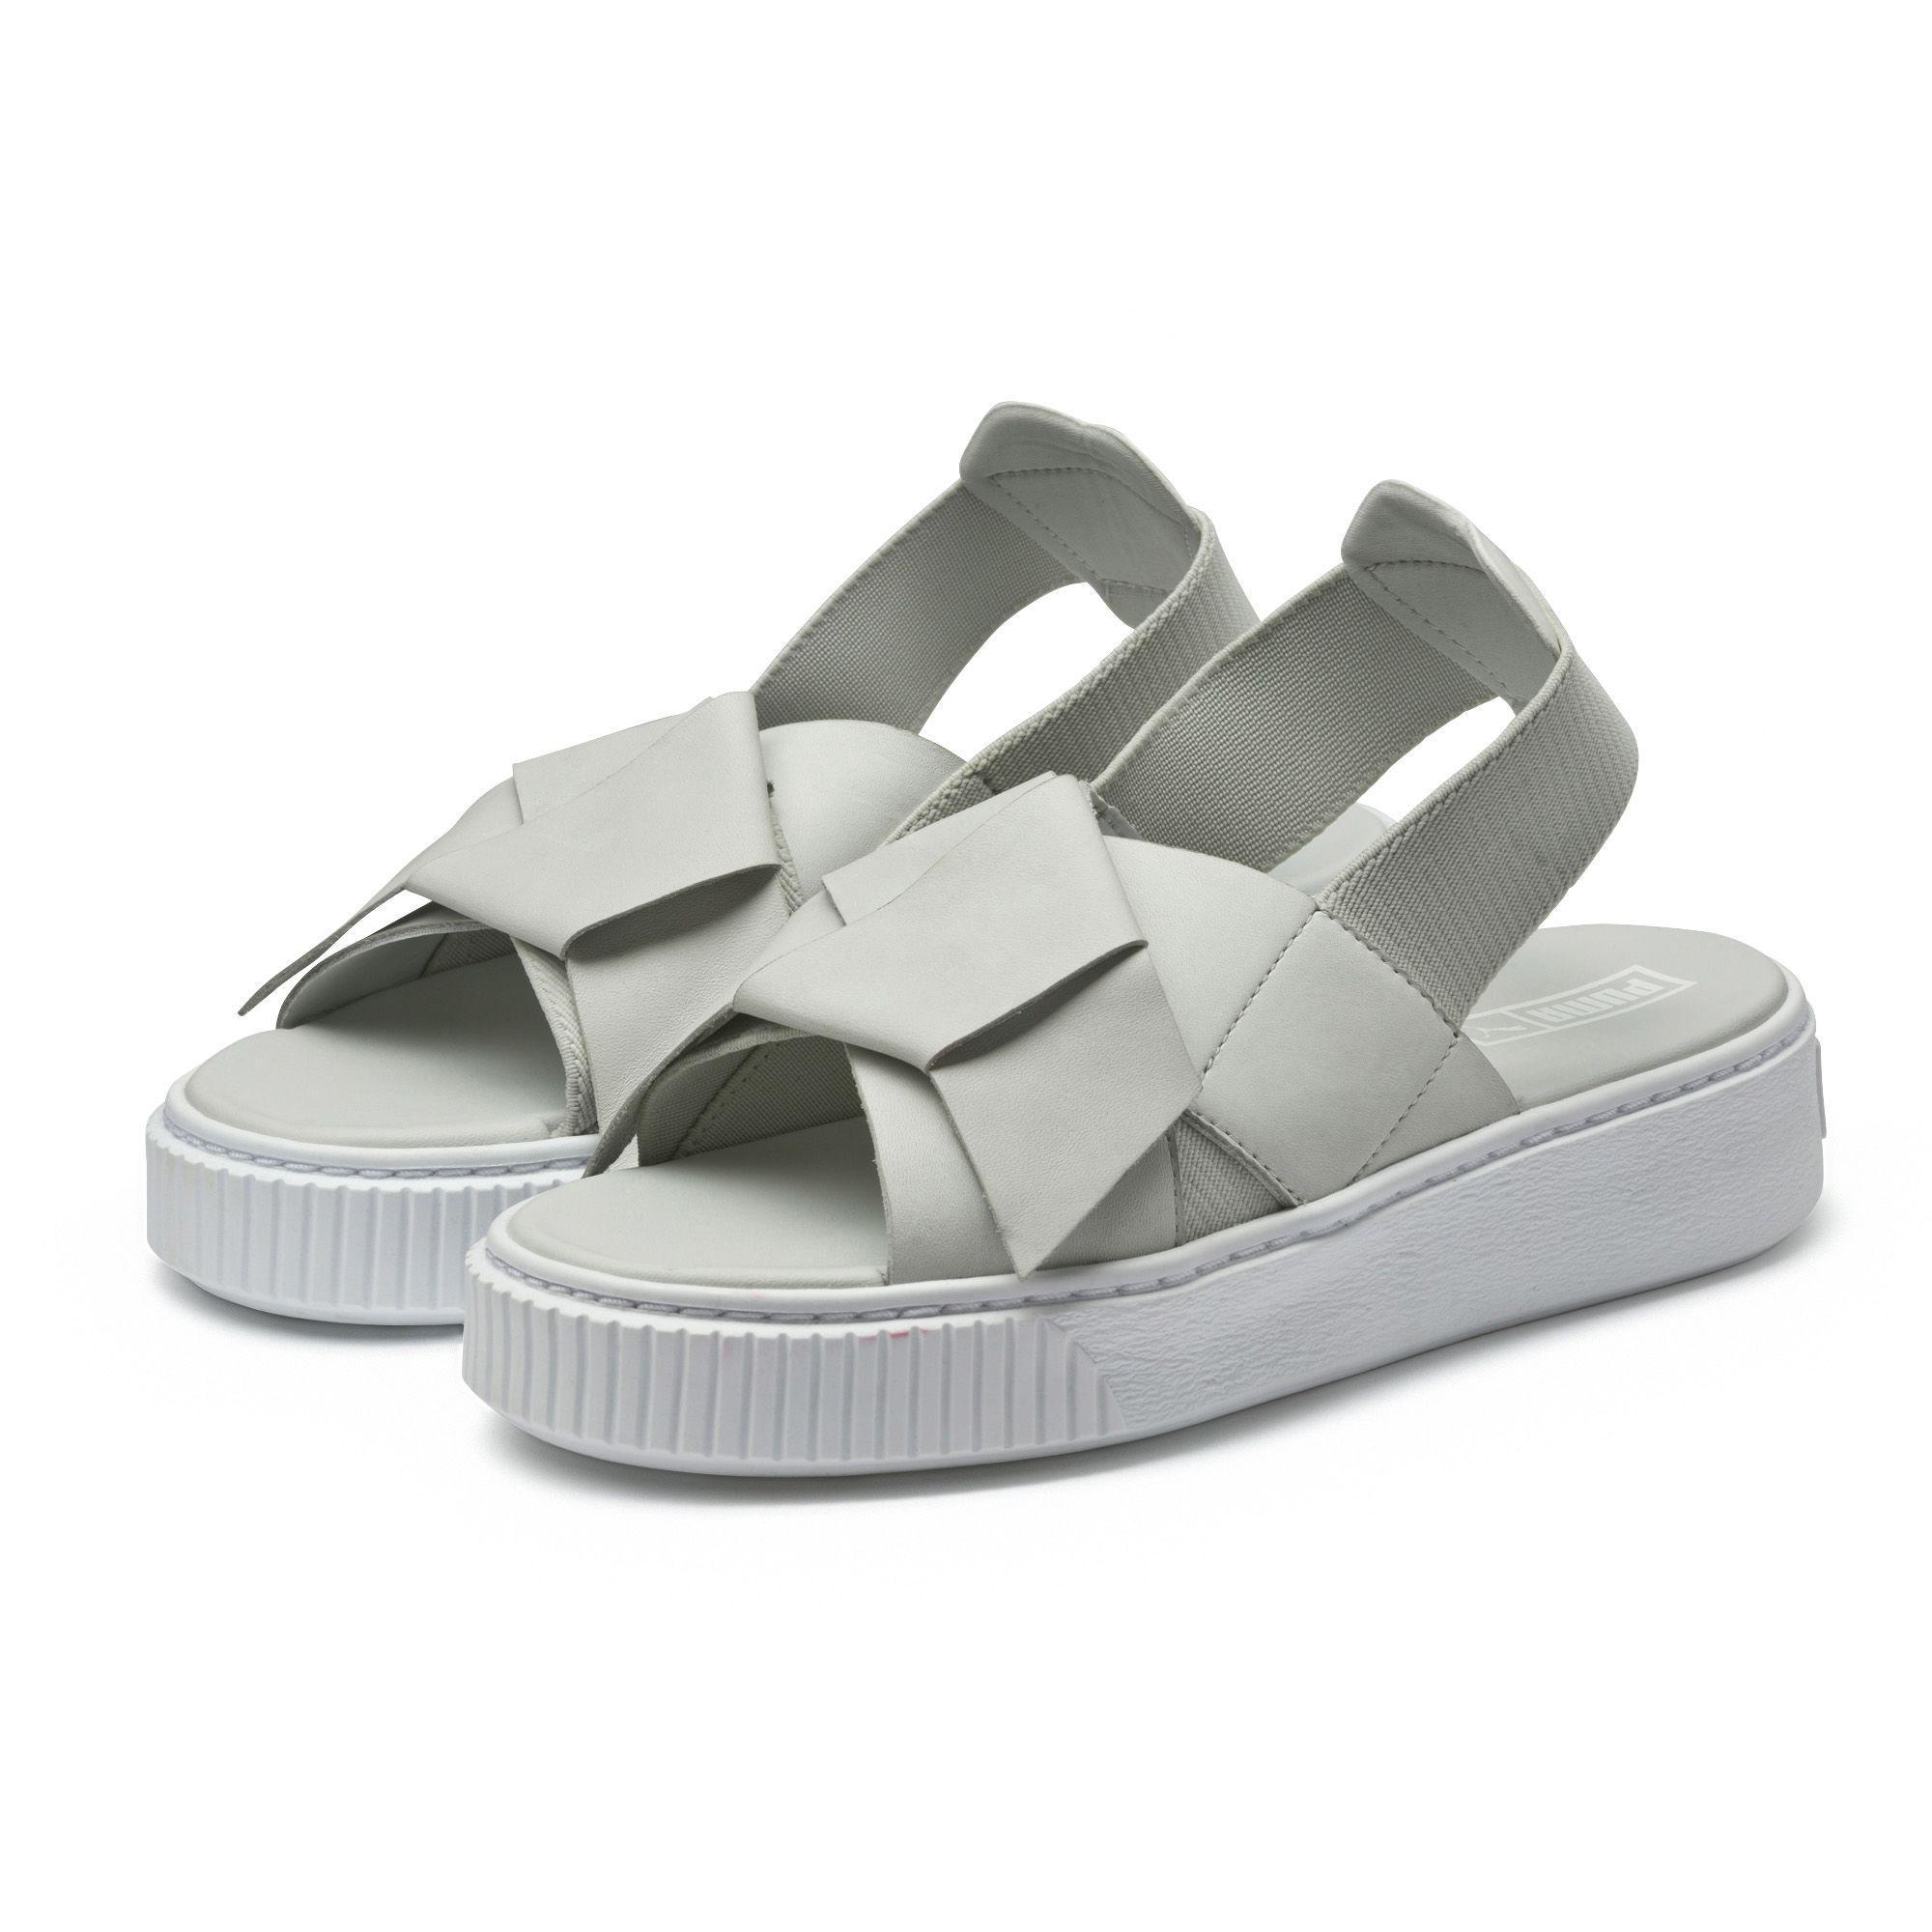 9f09cfa8e495 Lyst - PUMA Platform Leather Women s Sandals in Gray